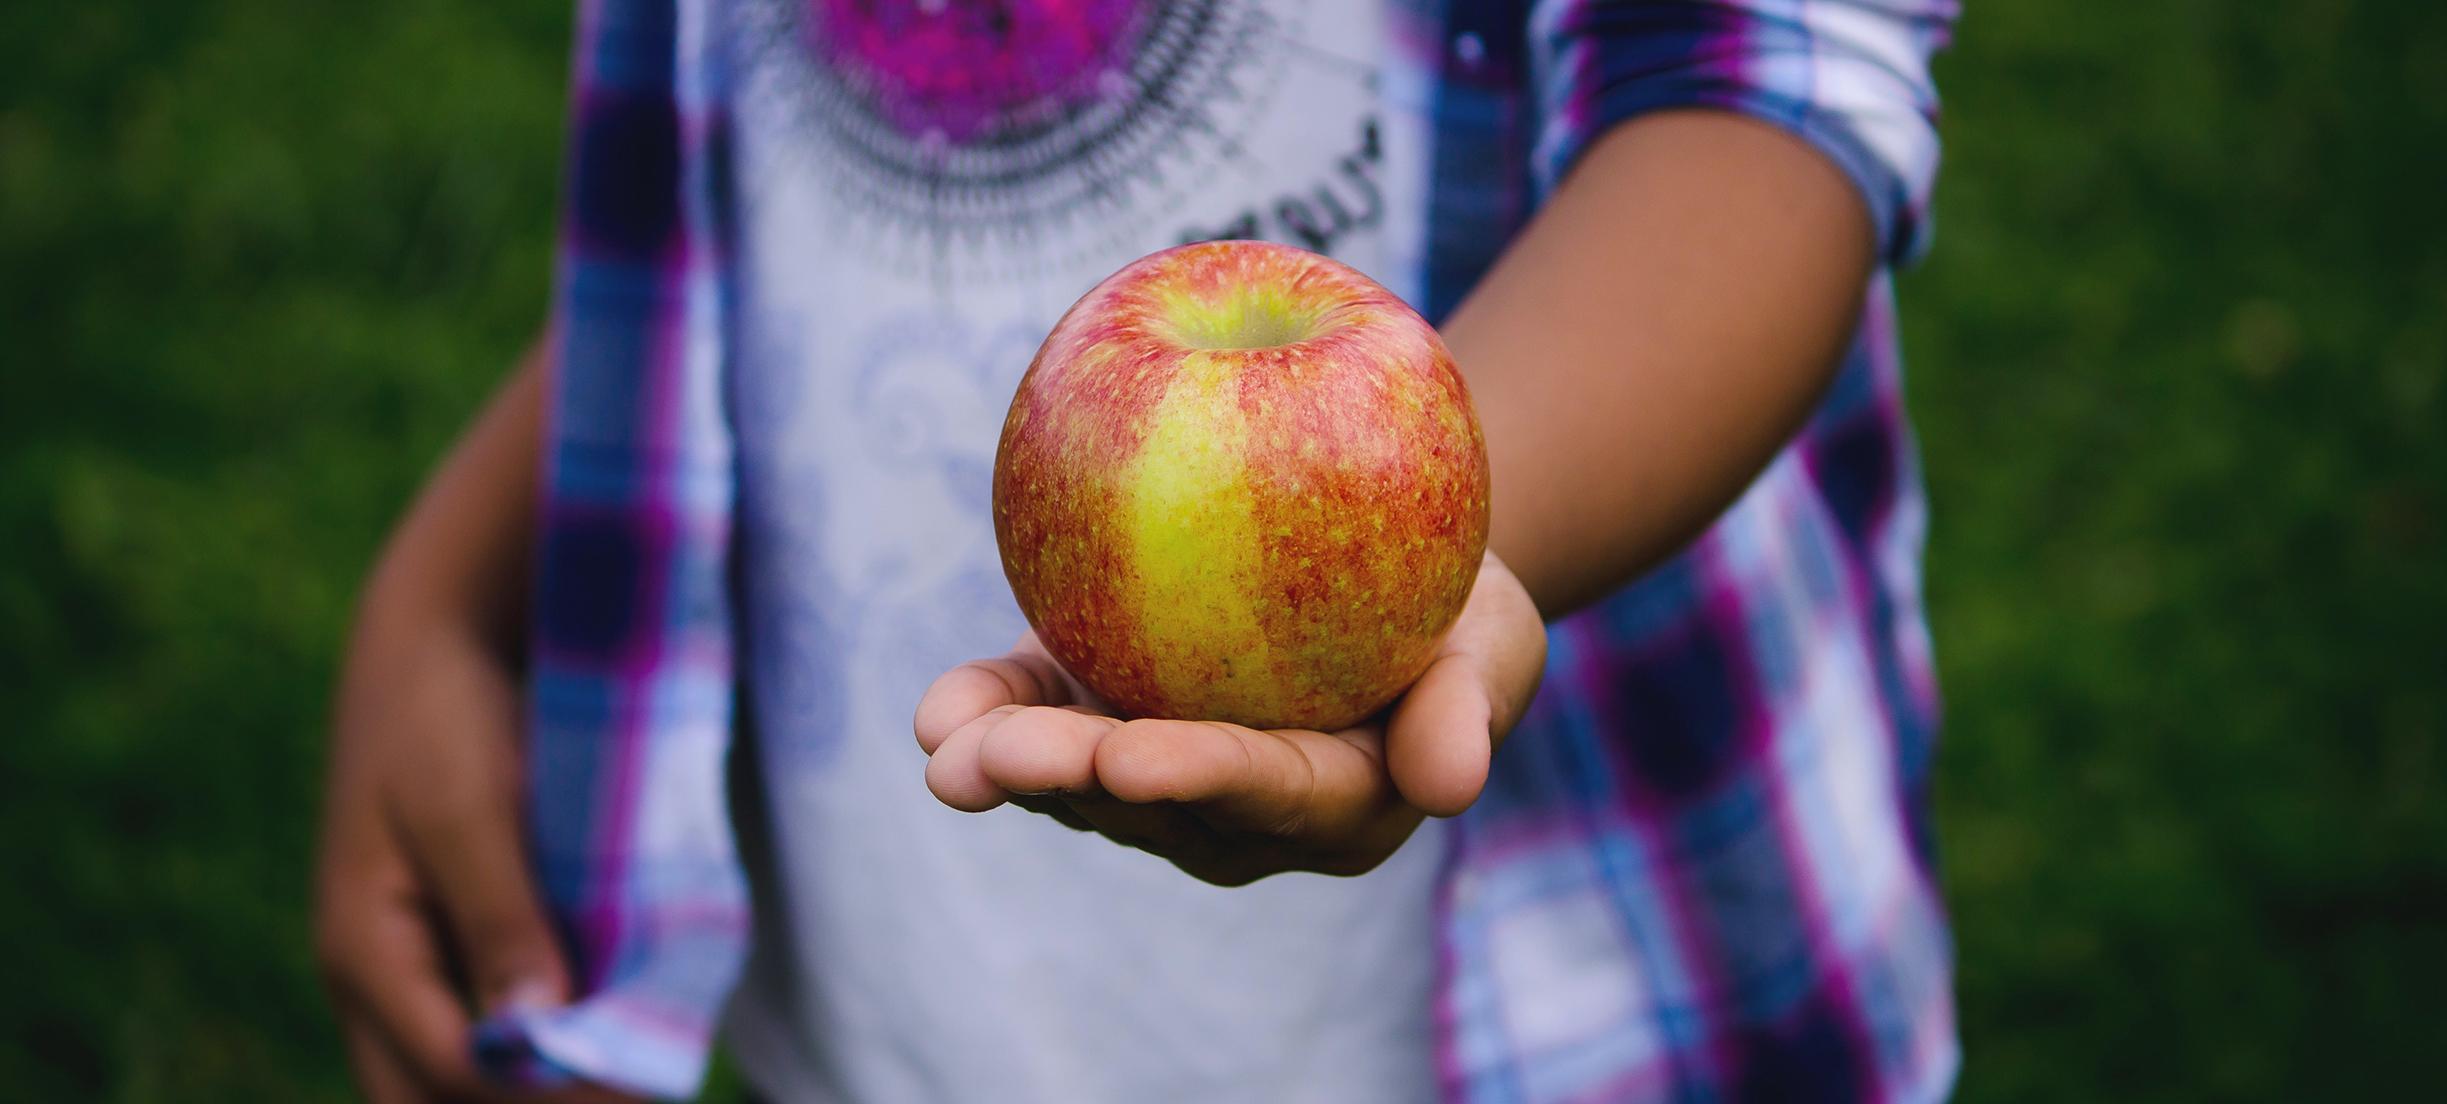 Adviesraad pleit voor suikertaks en minder btw op groente en fruit